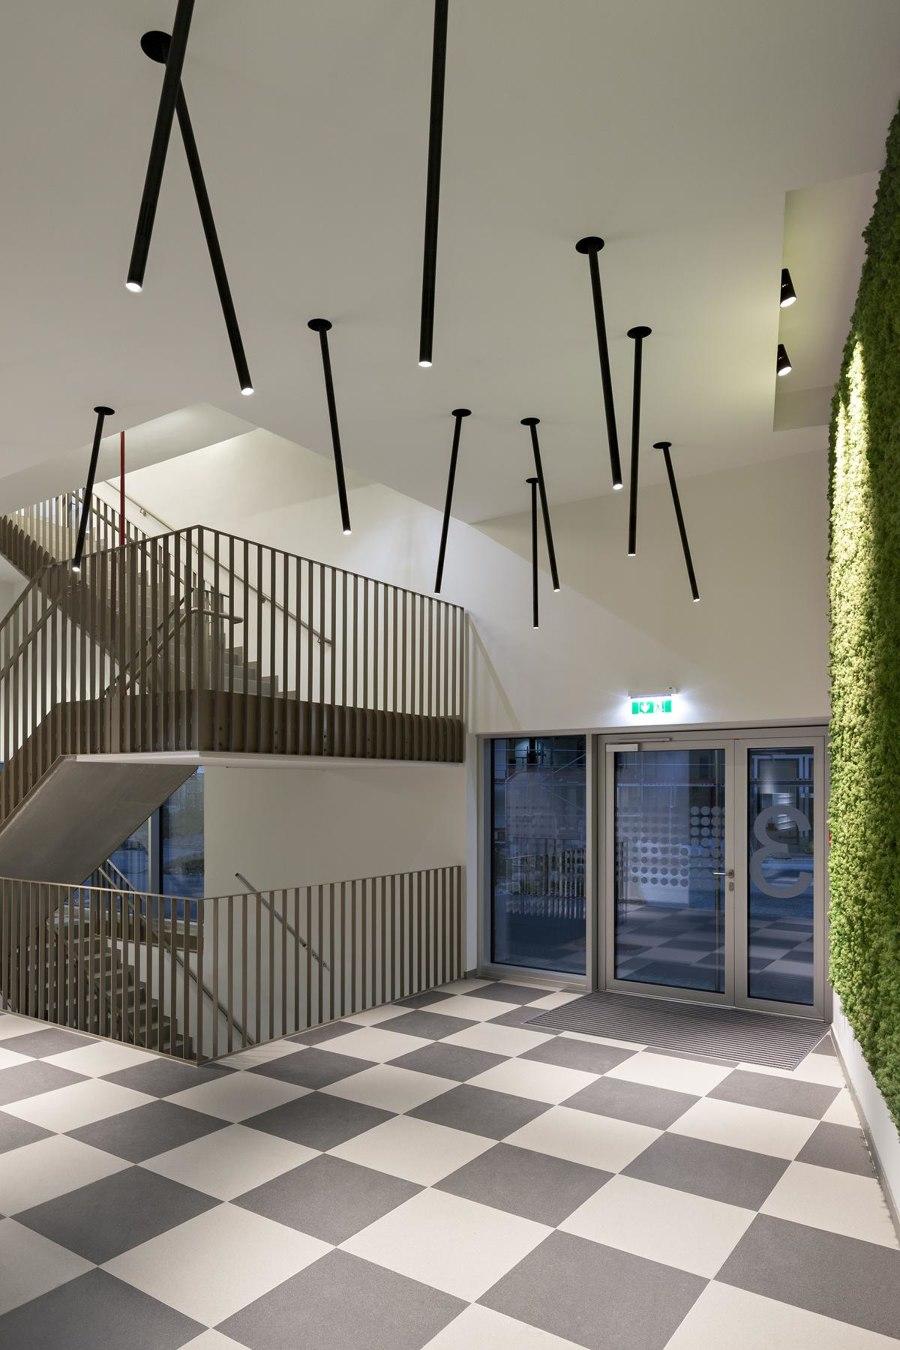 Living Garden Apartments by Martin Mostböck | Apartment blocks